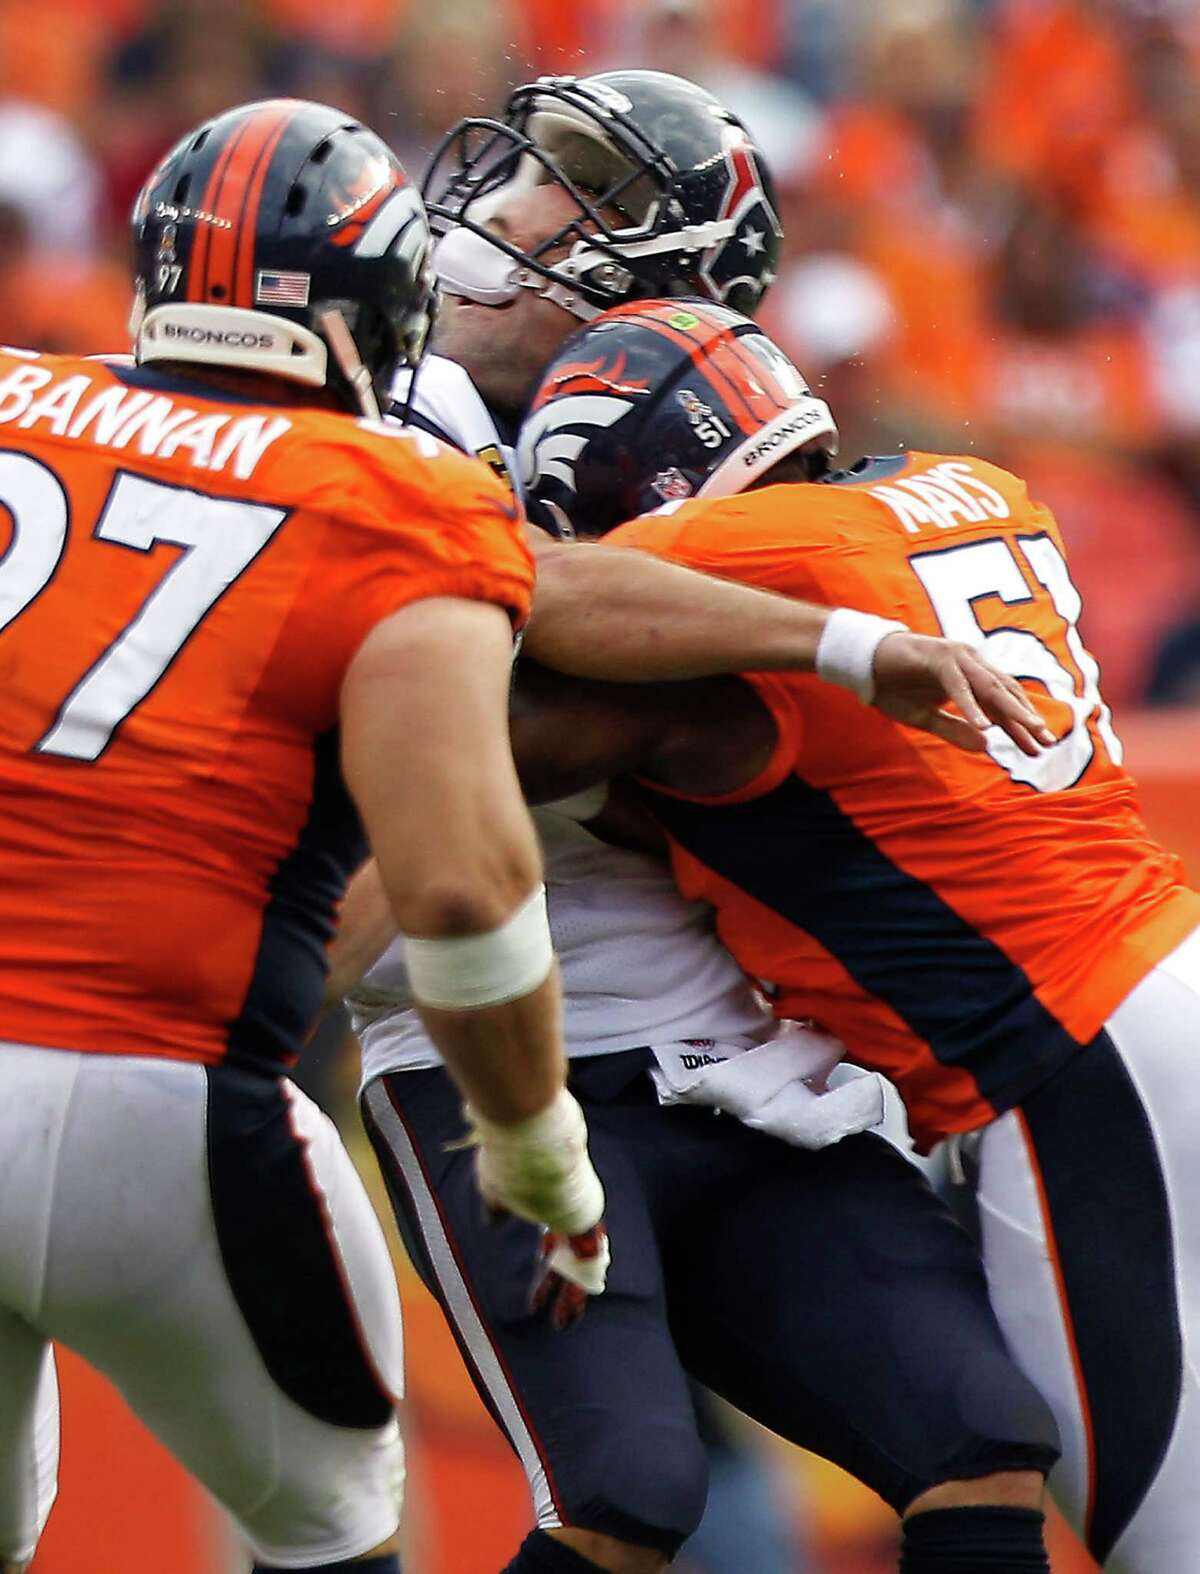 Joe Mays, right, was fined $50,000 for this hit on Texans quarterback Matt Schaub last season.